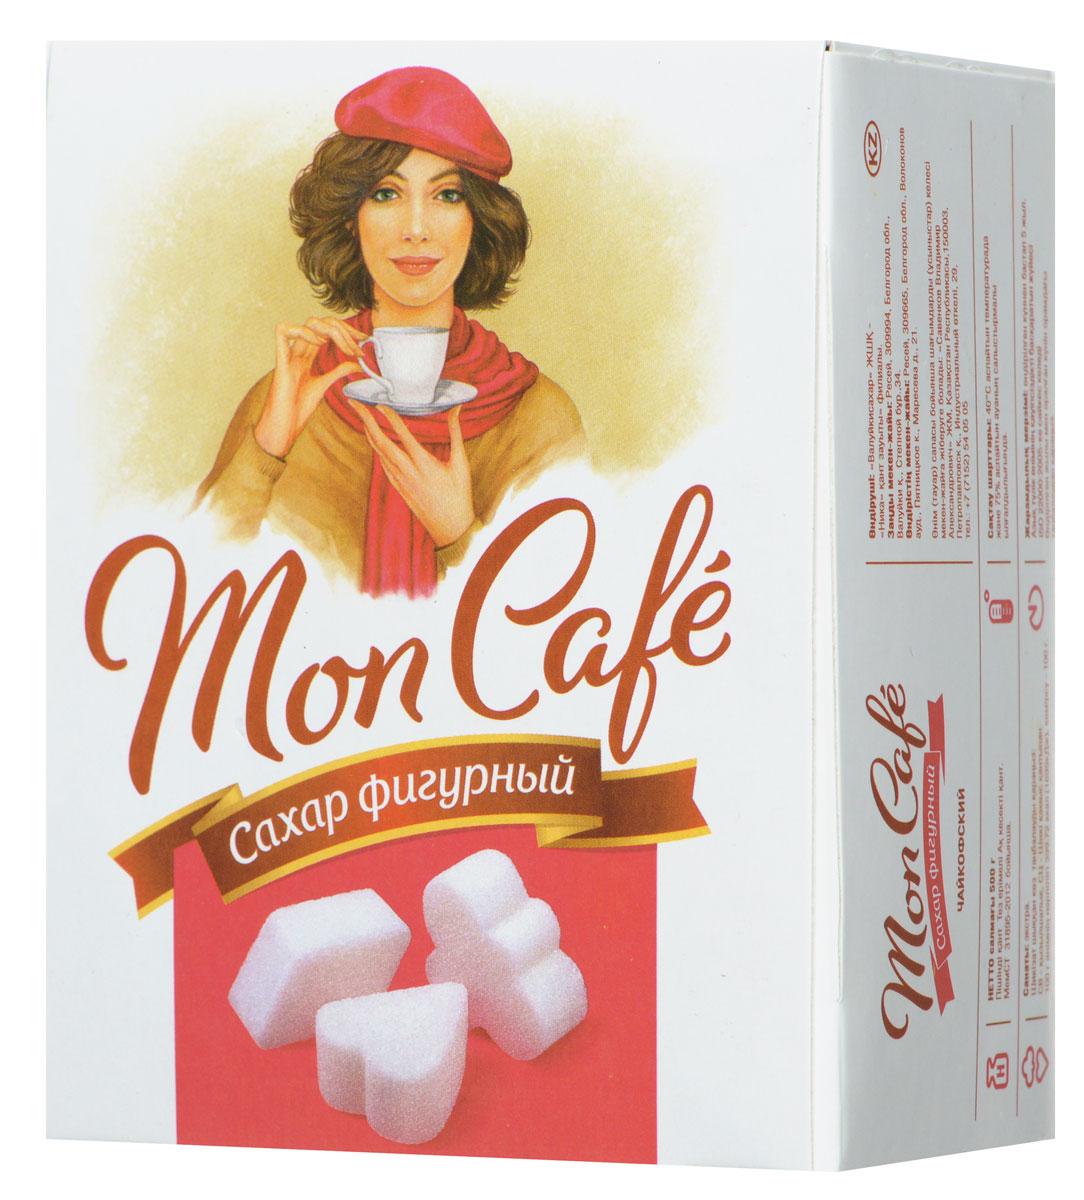 Чайкофский Mon Cafe сахар-рафинад фигурный, 500 г